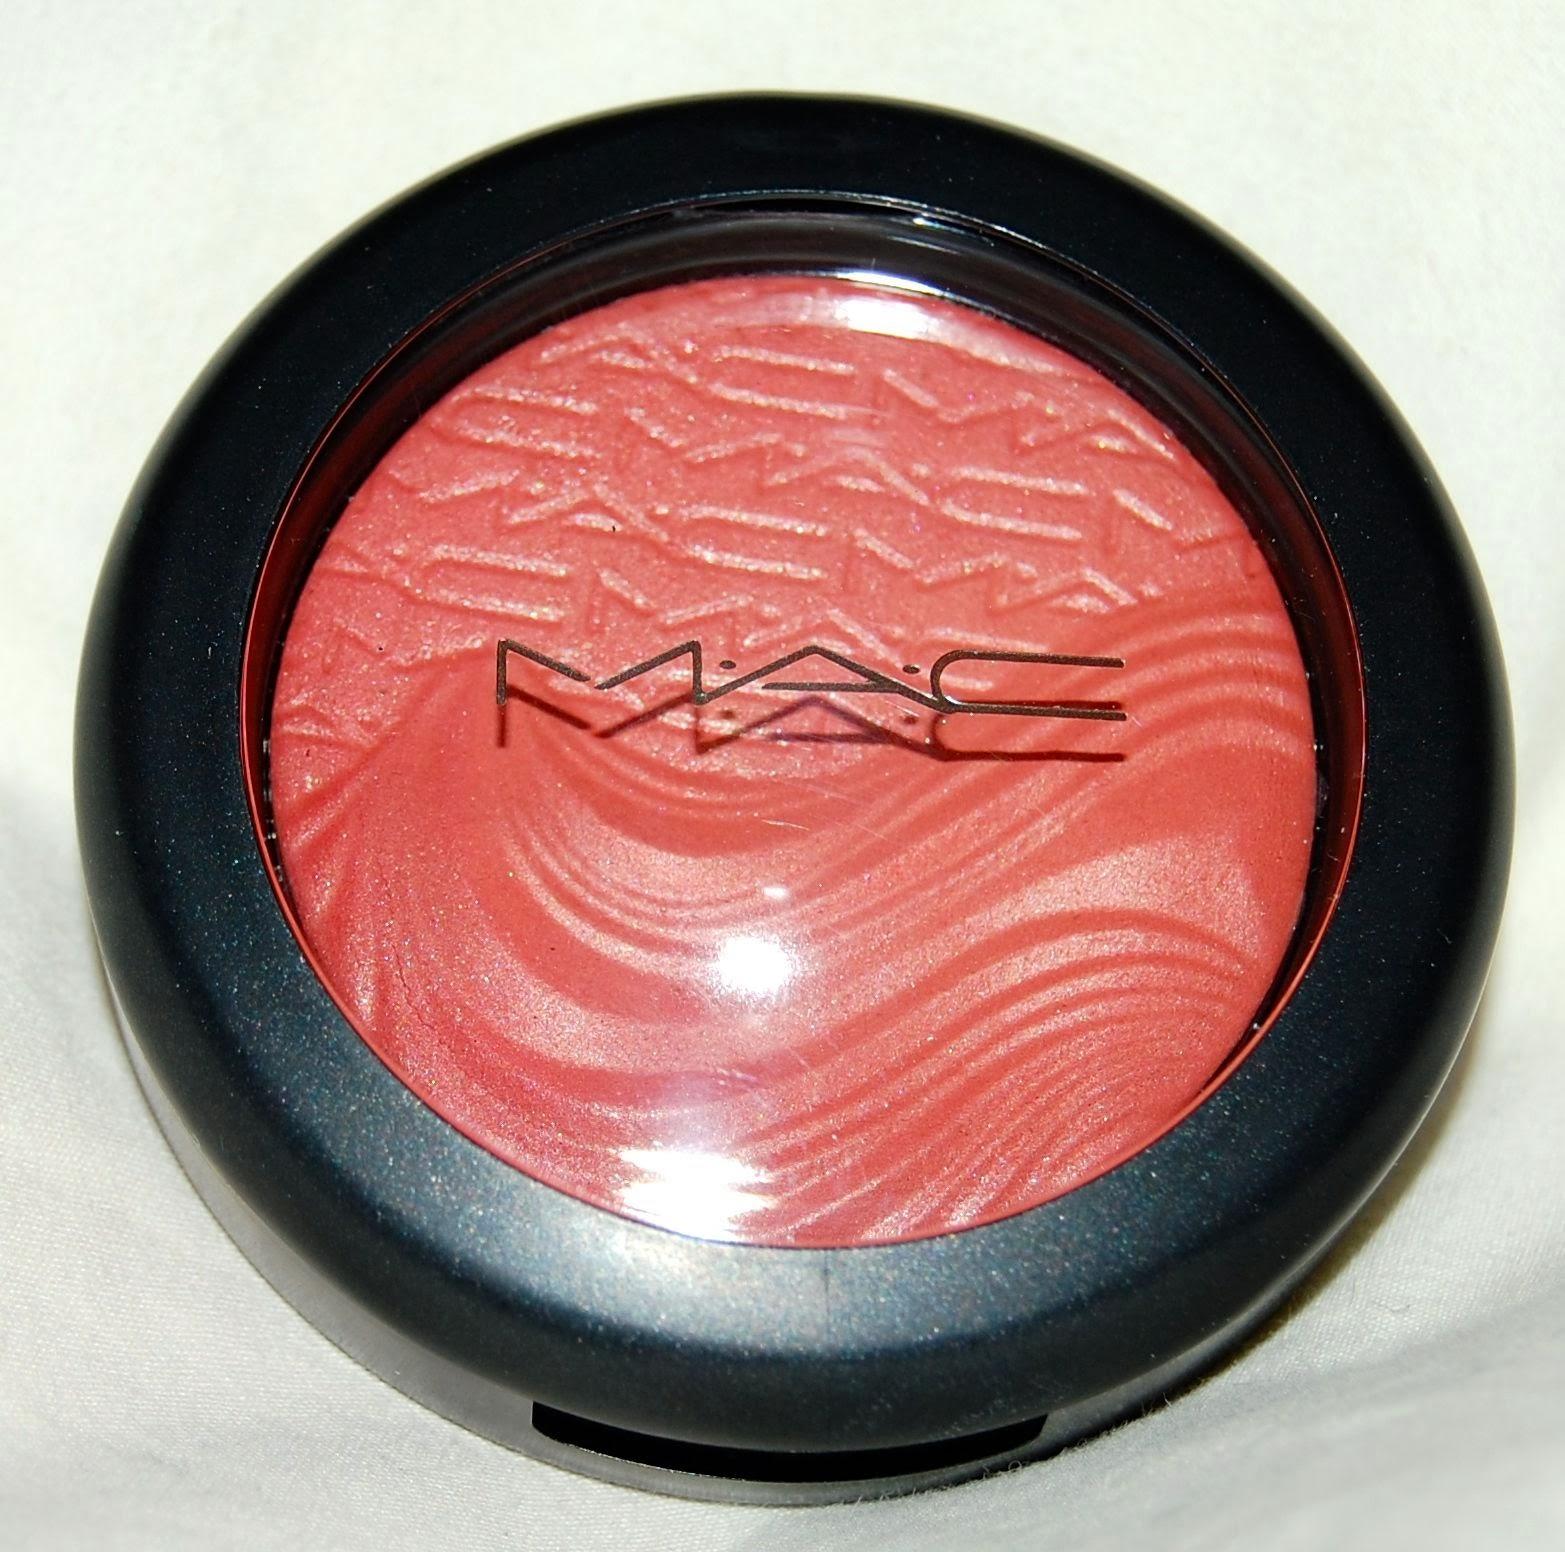 MAC-Magnetic-Nude-Extra-Dimension-Eyeshadow - Beauty